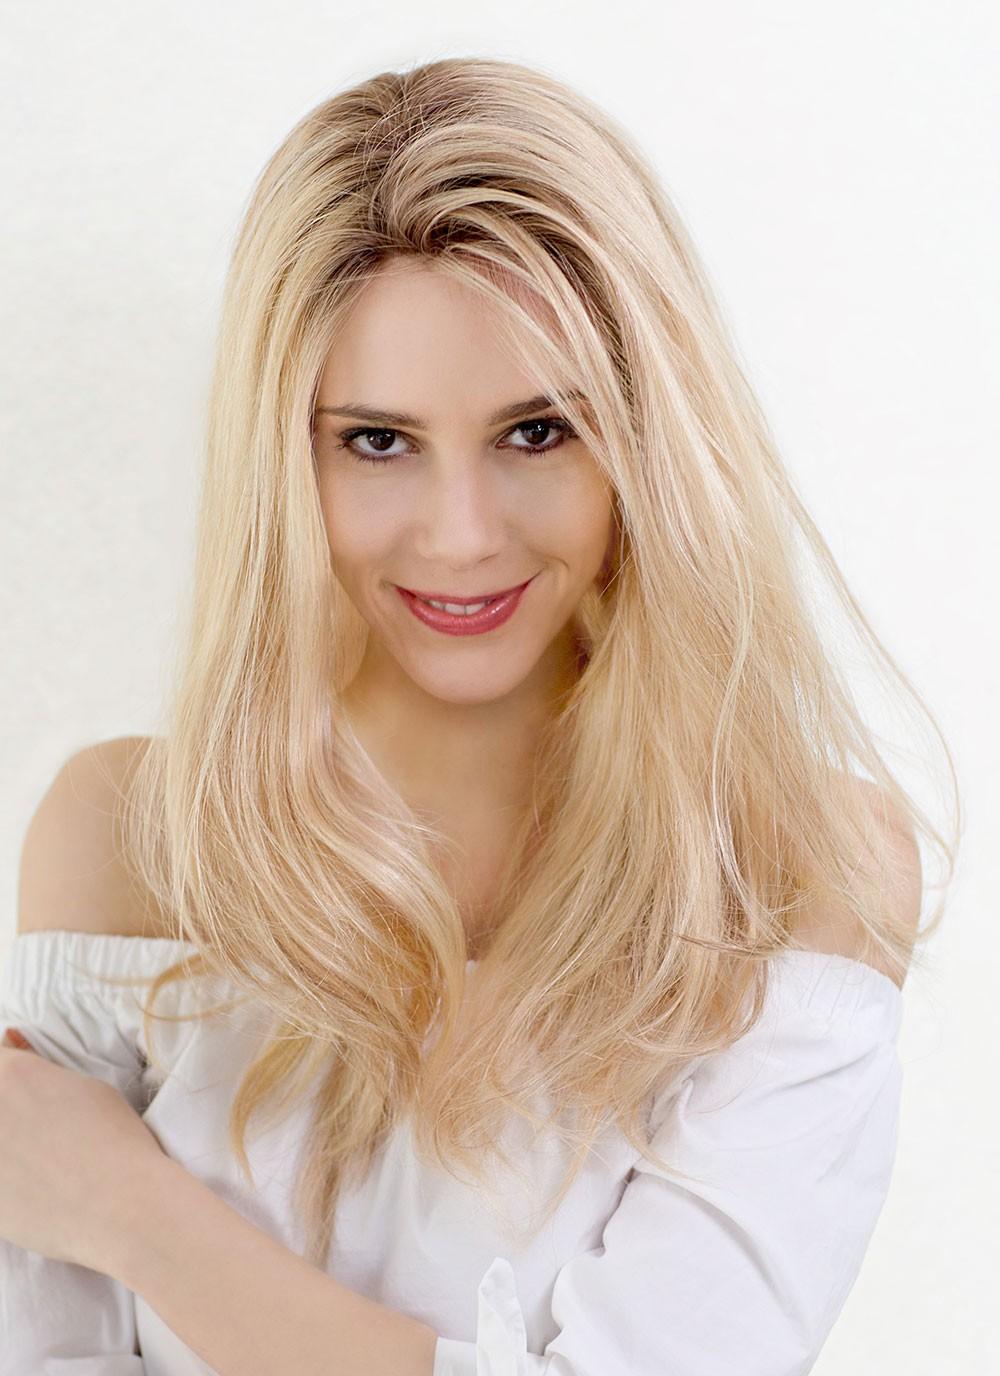 Long Natural Looking Real Human Hair Blonde Wigs